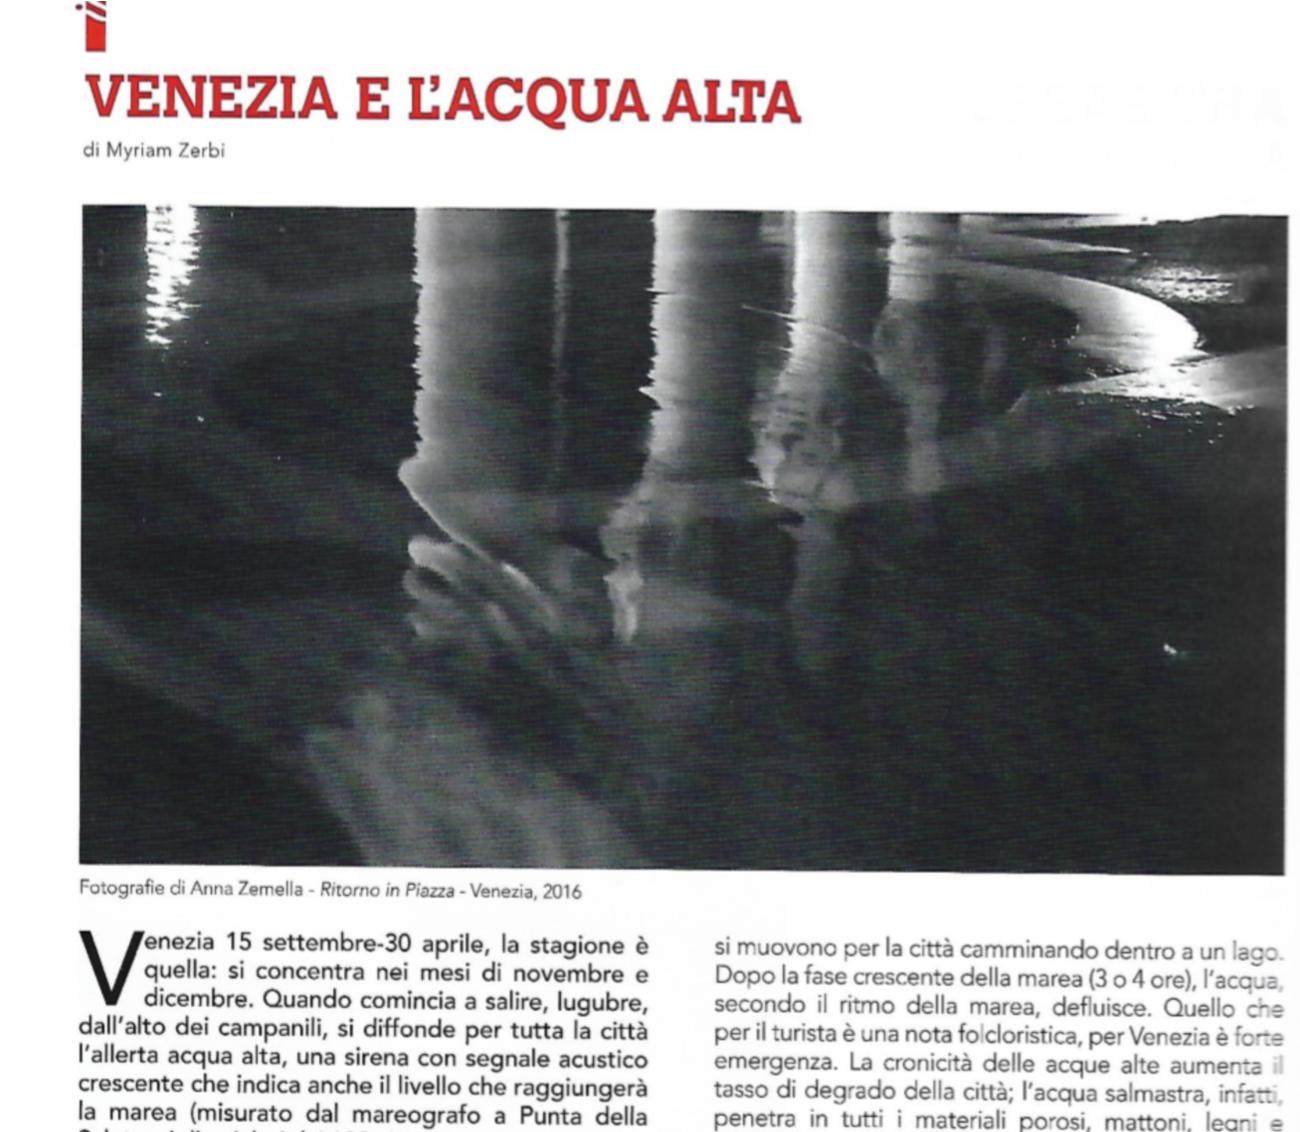 MonteCarloin, January/February 2018: Venezia E L'acqua Alta